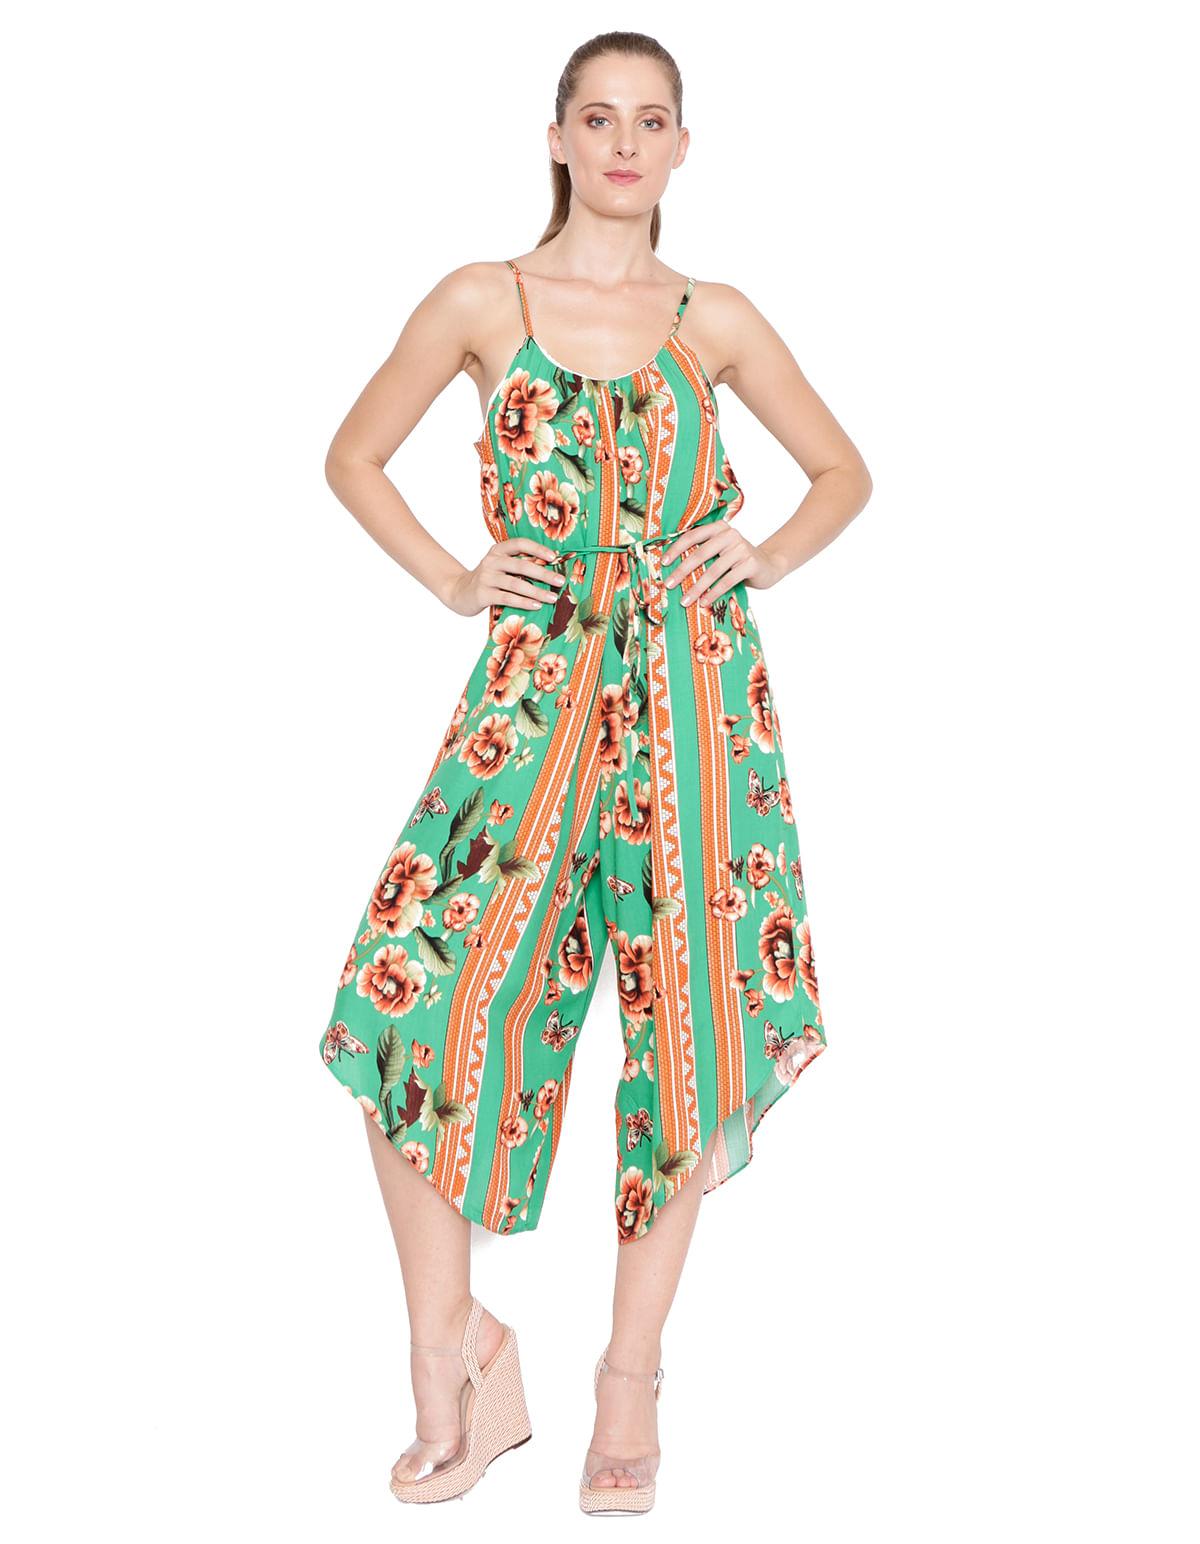 fe09c13f14 Macacao pantacourt c. faixa verde laranja - LucyintheSky